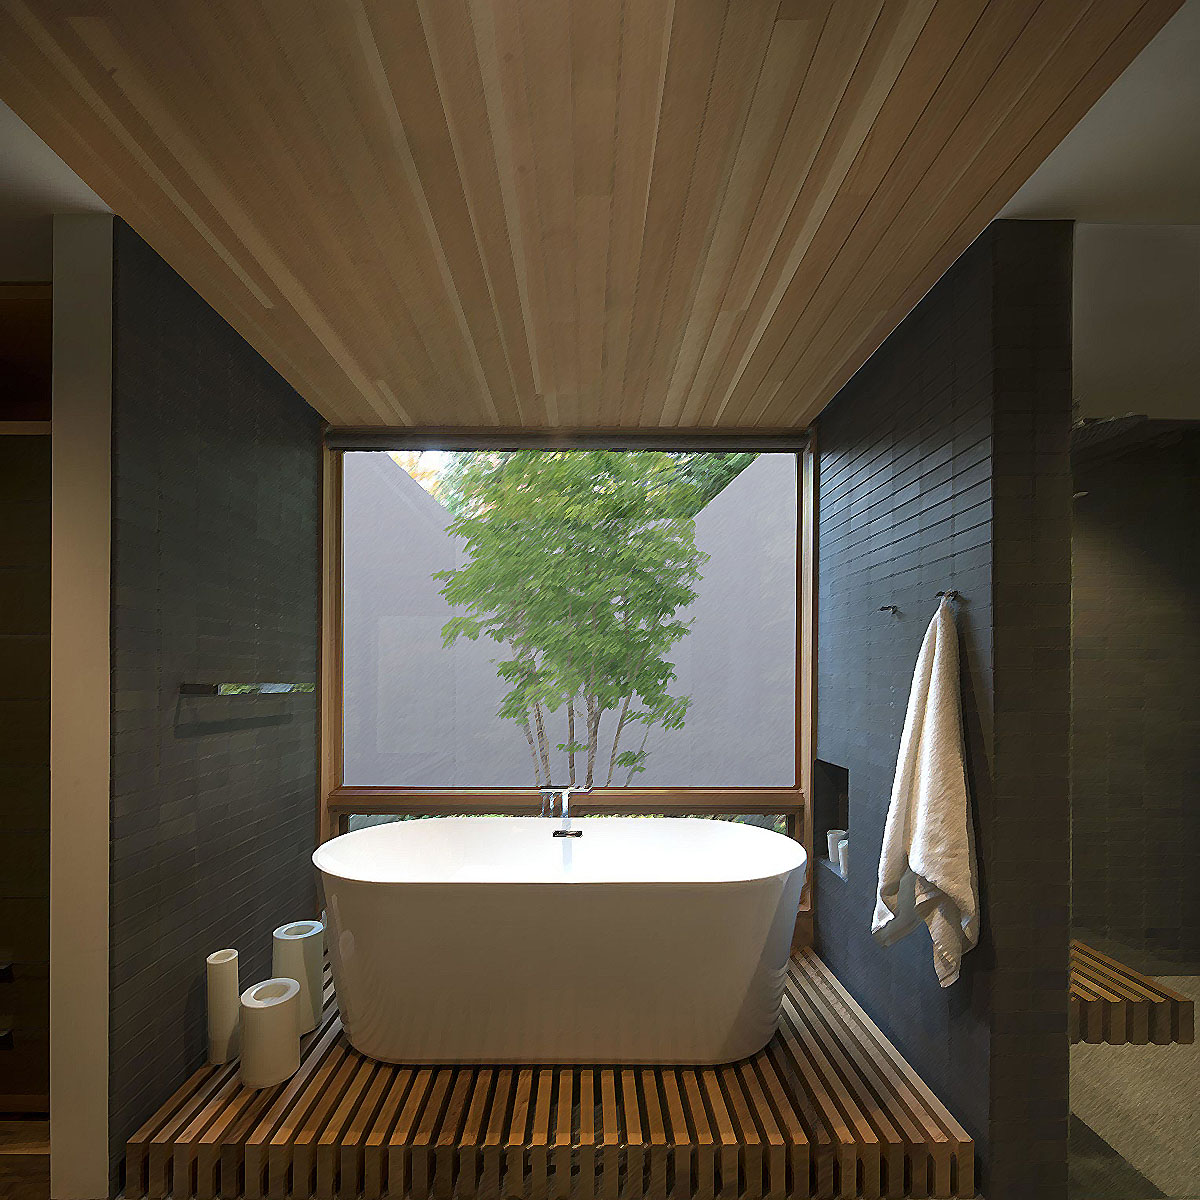 patio-huis-badkamer-buitenbad